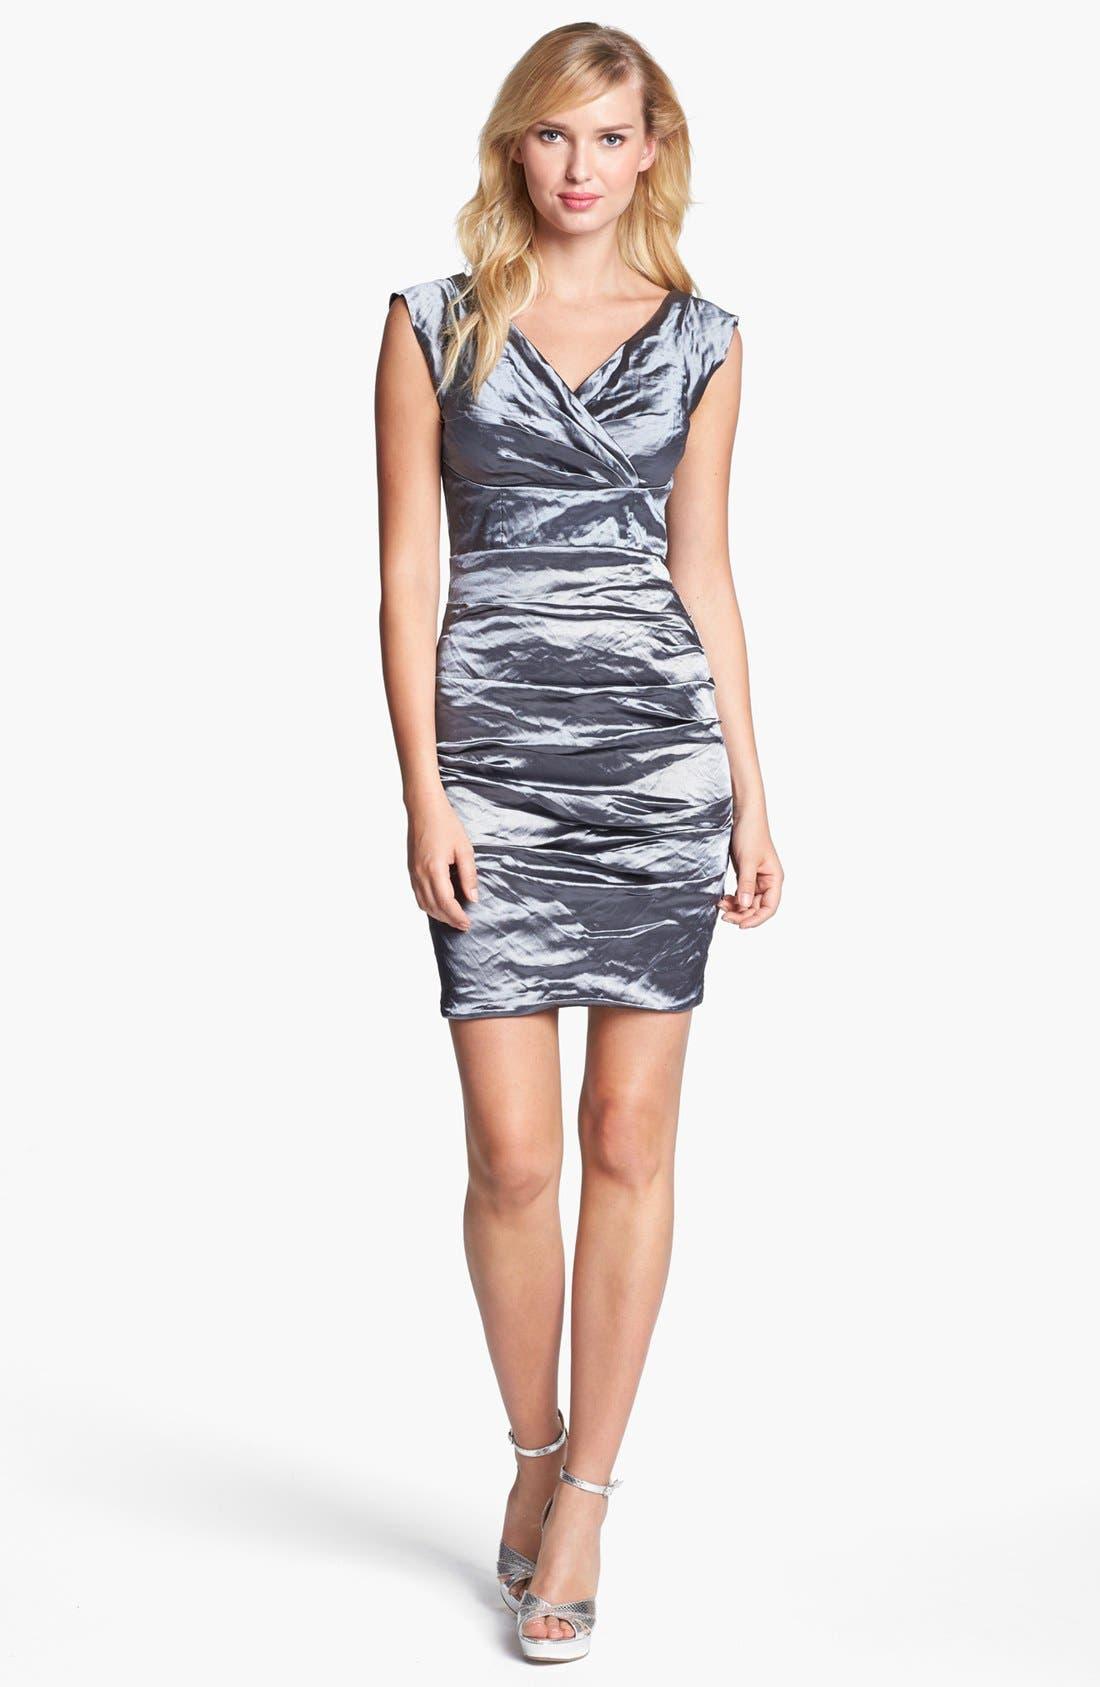 Main Image - Nicole Miller Techno Metal Textured Dress